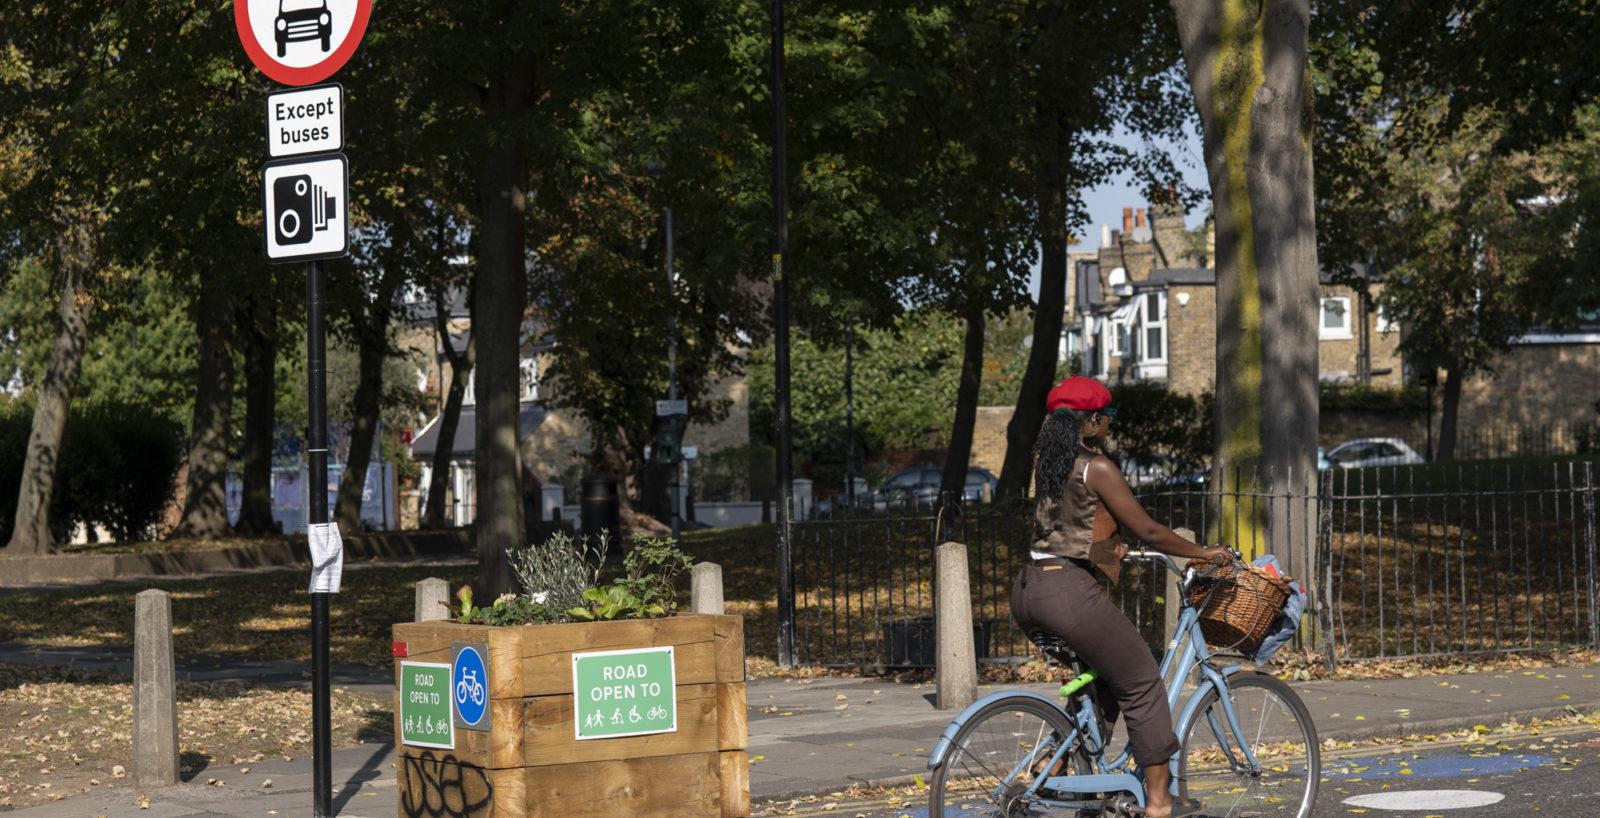 A woman cycles through the Railton Low Traffic Neighbourhood in Brixton